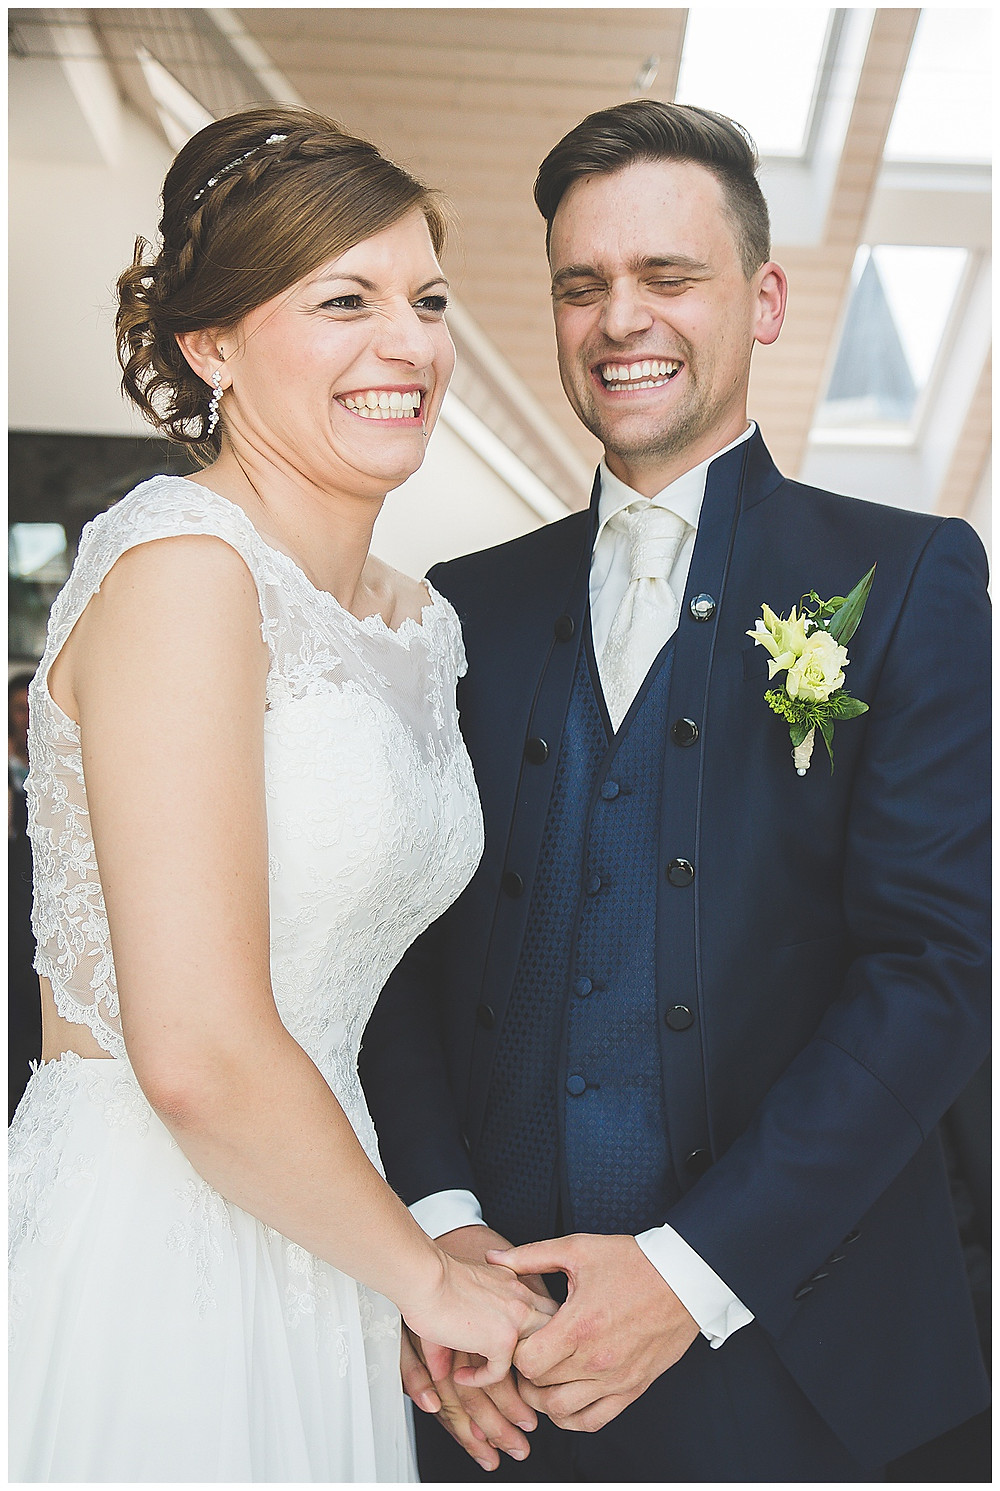 Brautpaar Ja Wort Peiting Standesamt